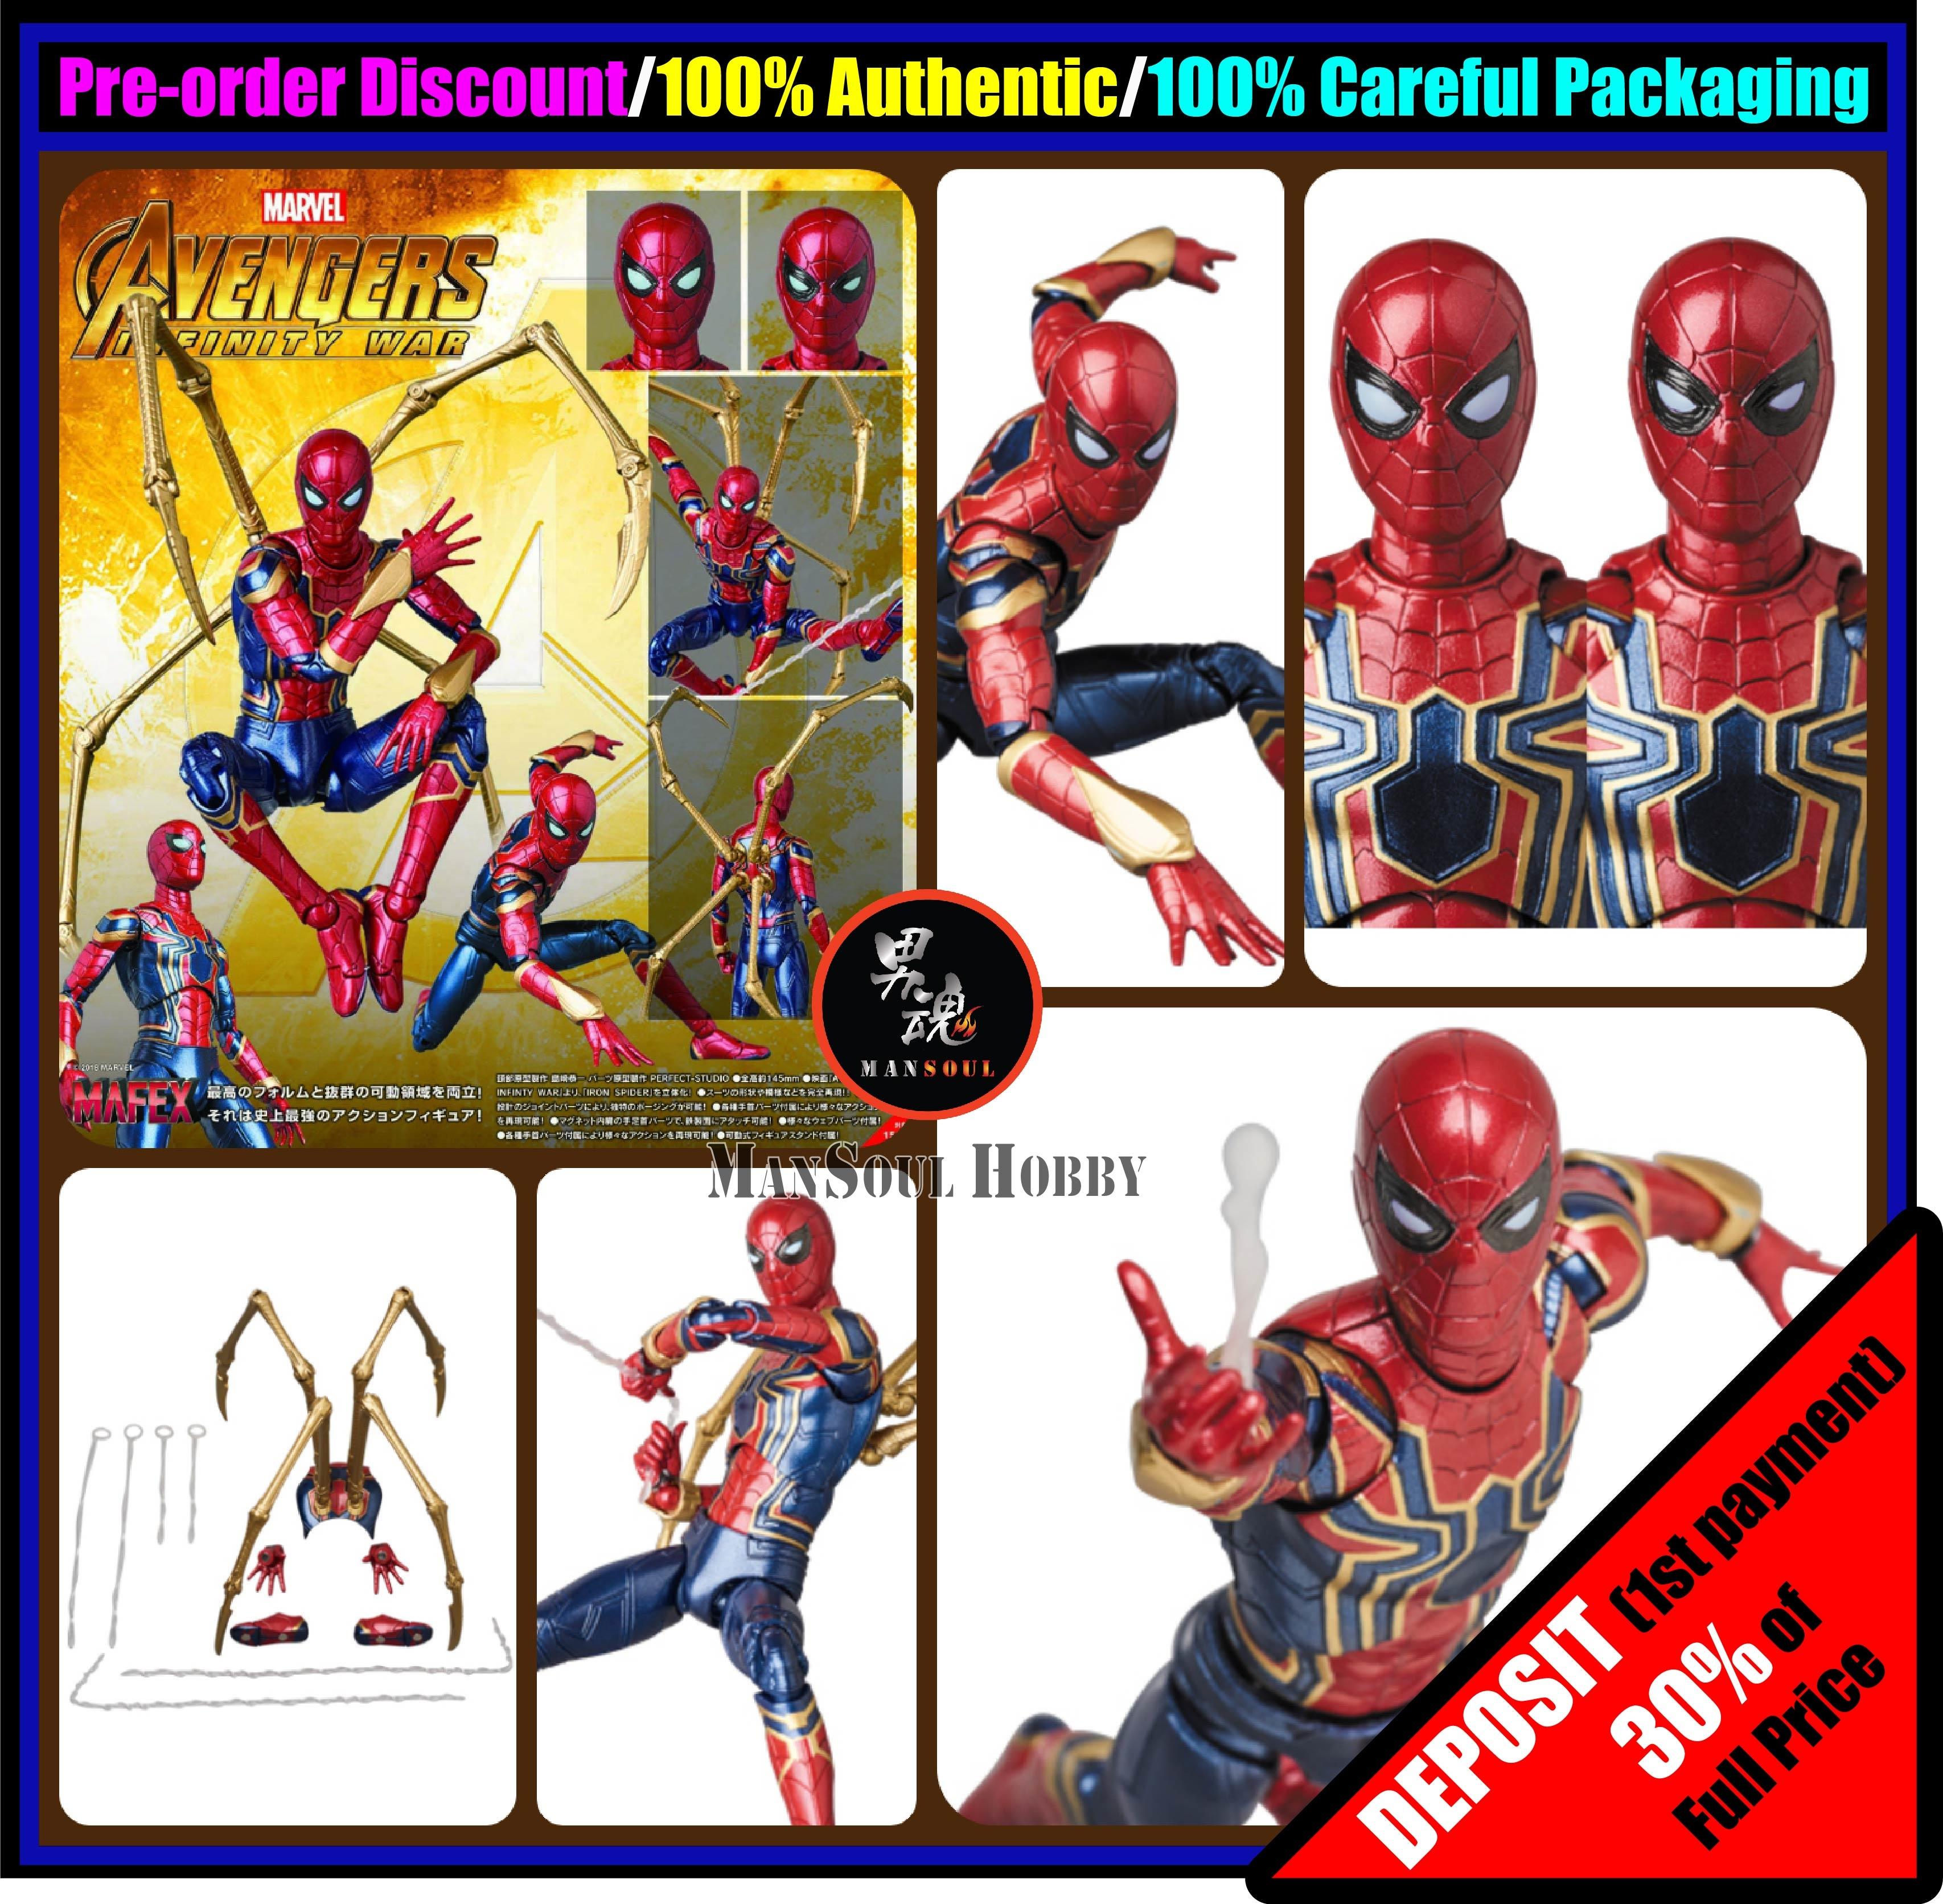 Medicom Toy Mafex Avengers Infinity War Iron Spider